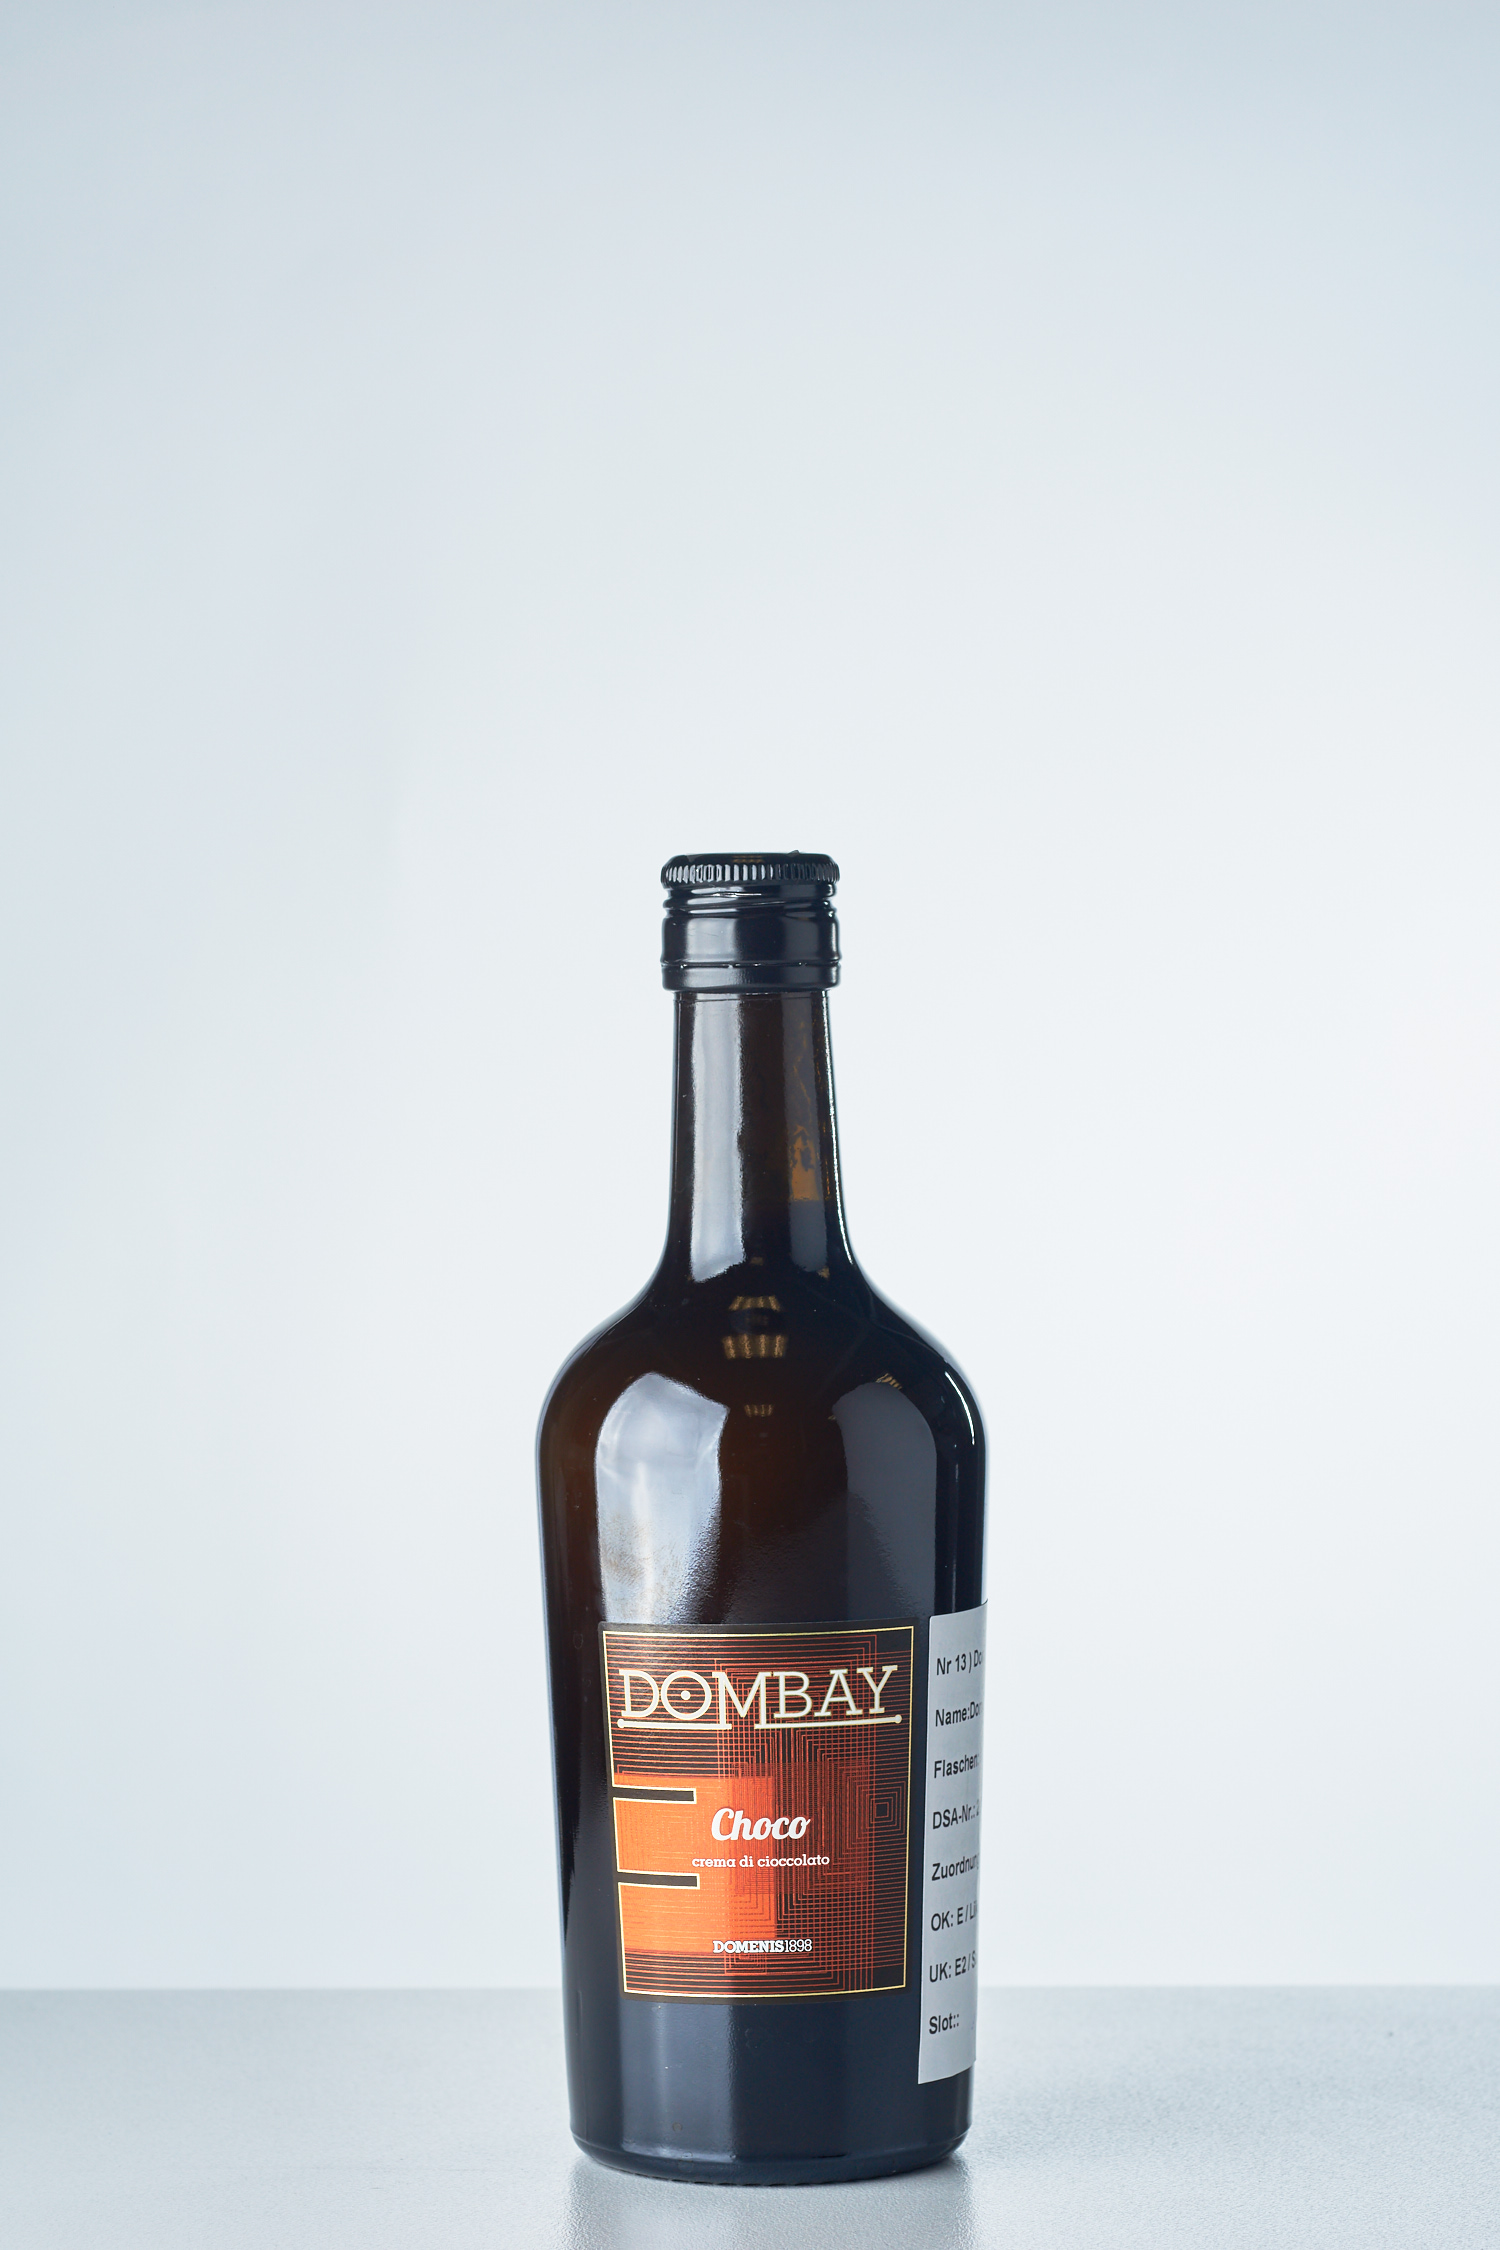 DOMENIS1898 SRL - Dombay Choco